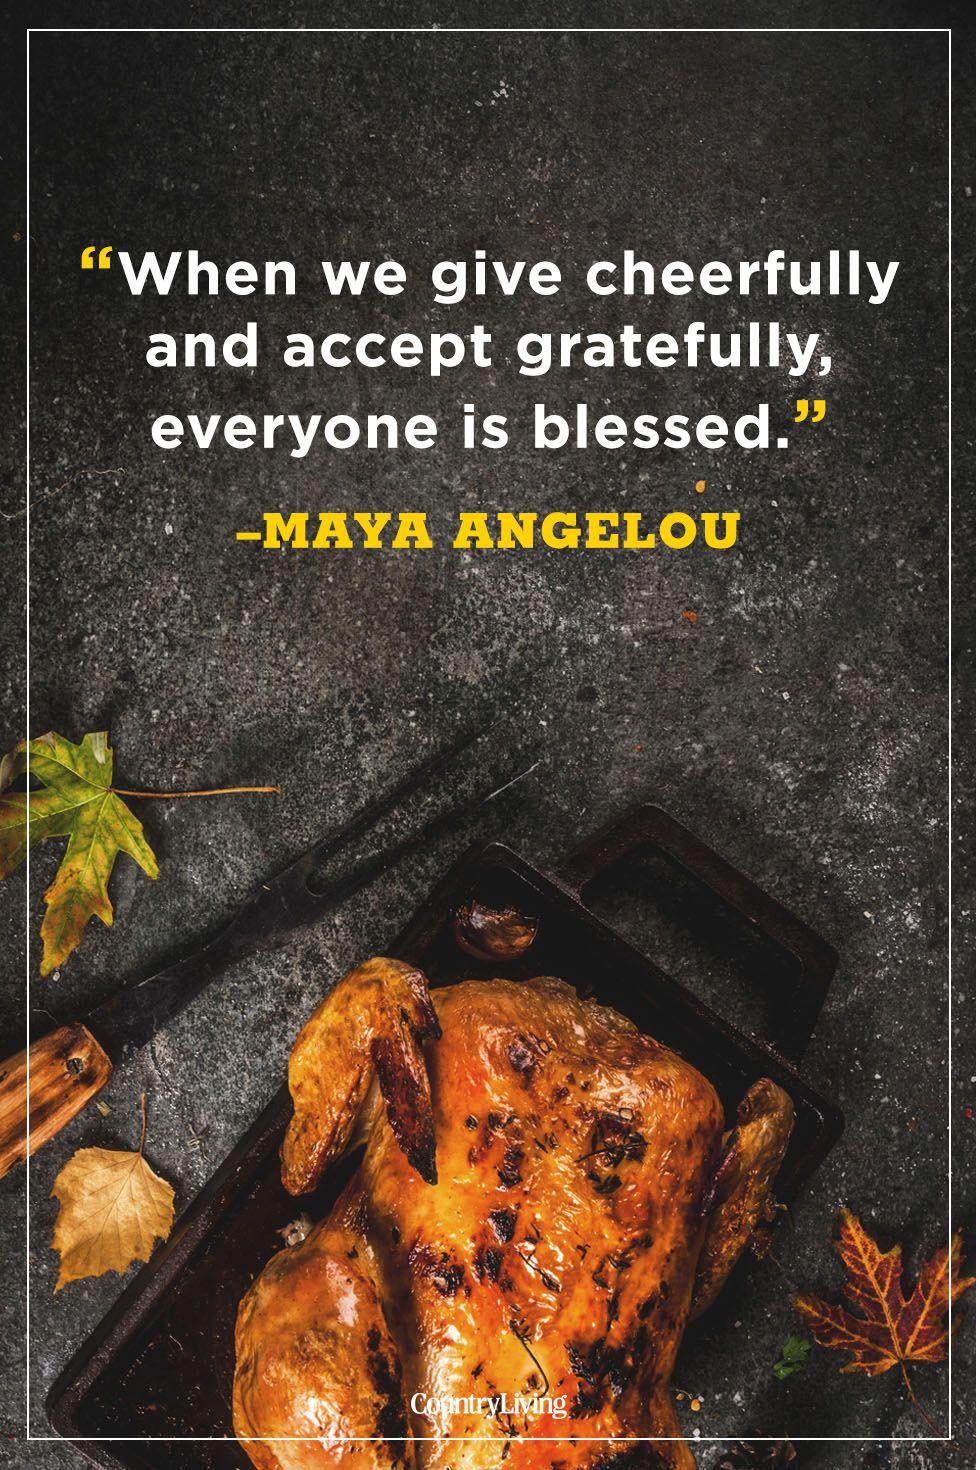 thanksgiving quotes maya angelou